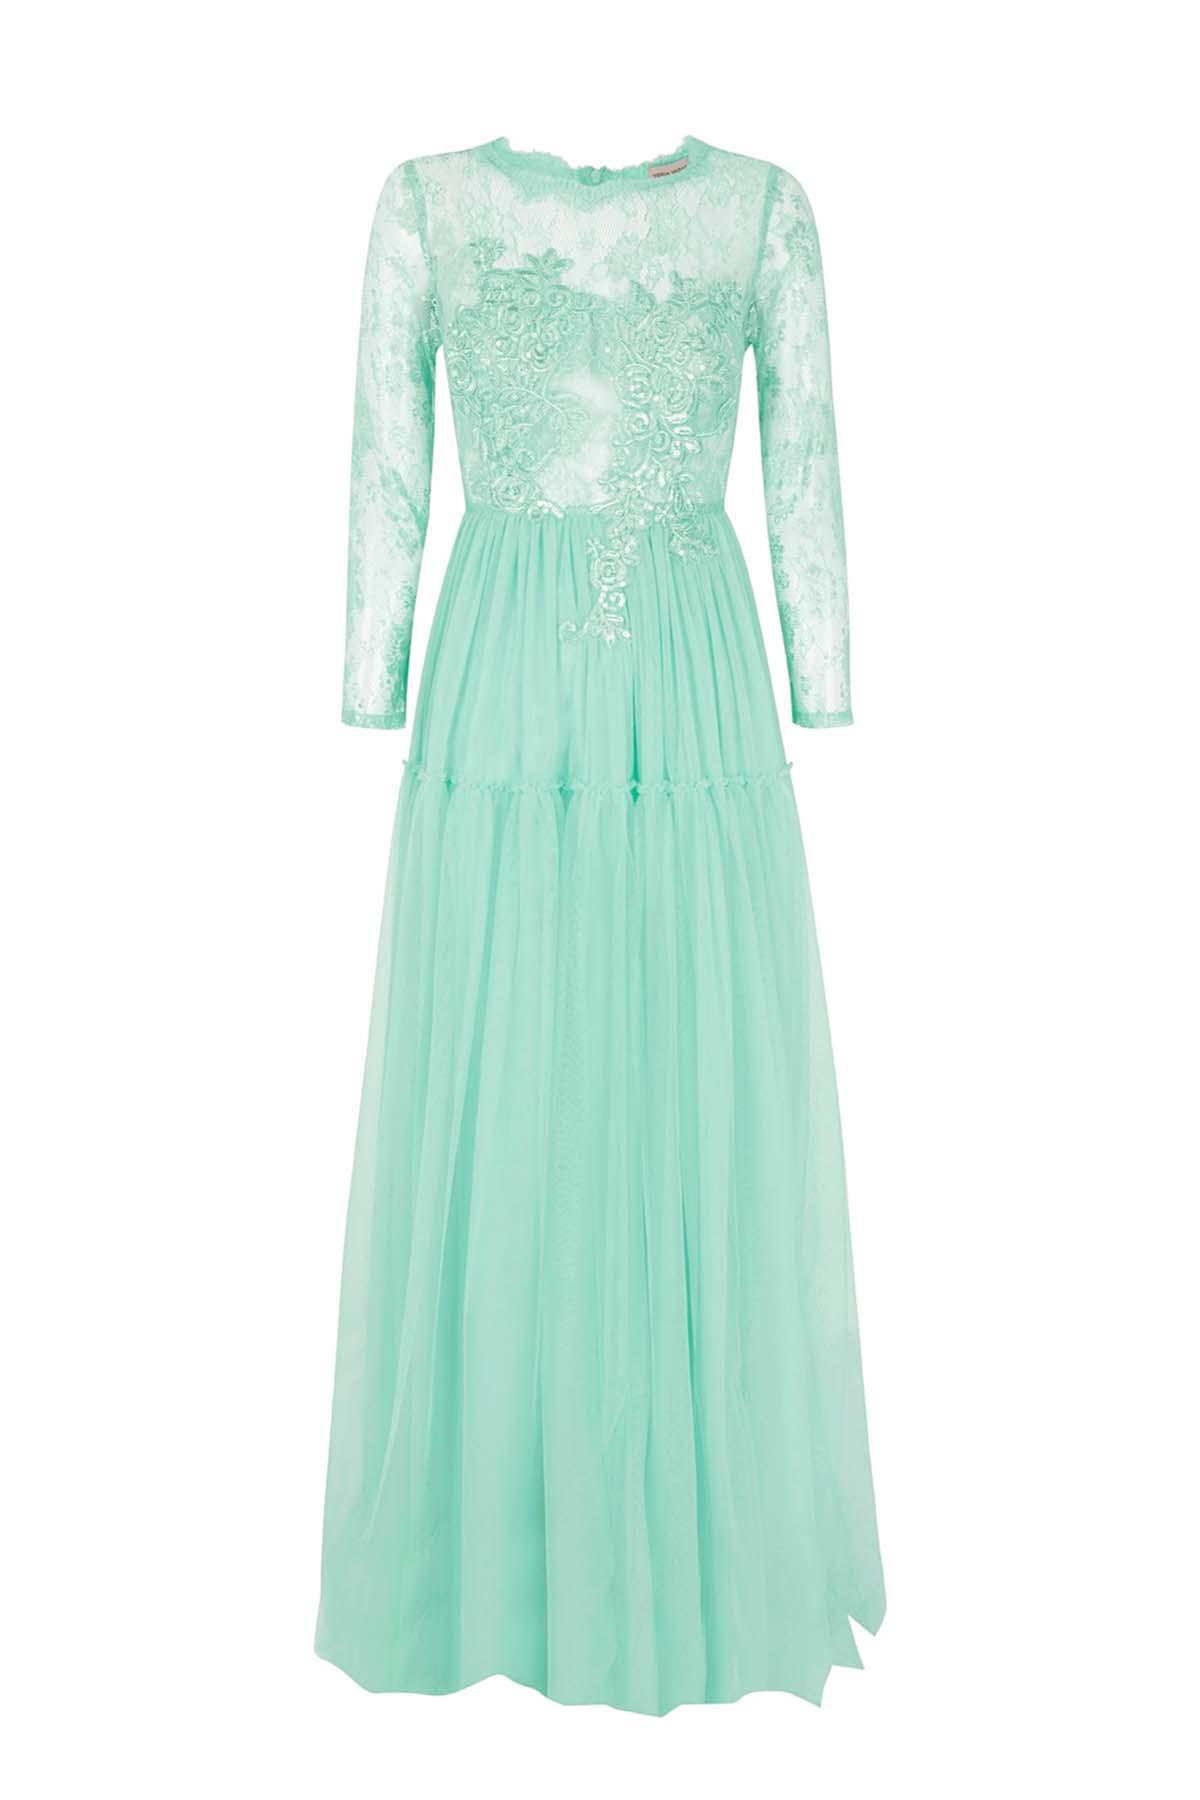 Teria Yabar - Vestido ópera verde agua